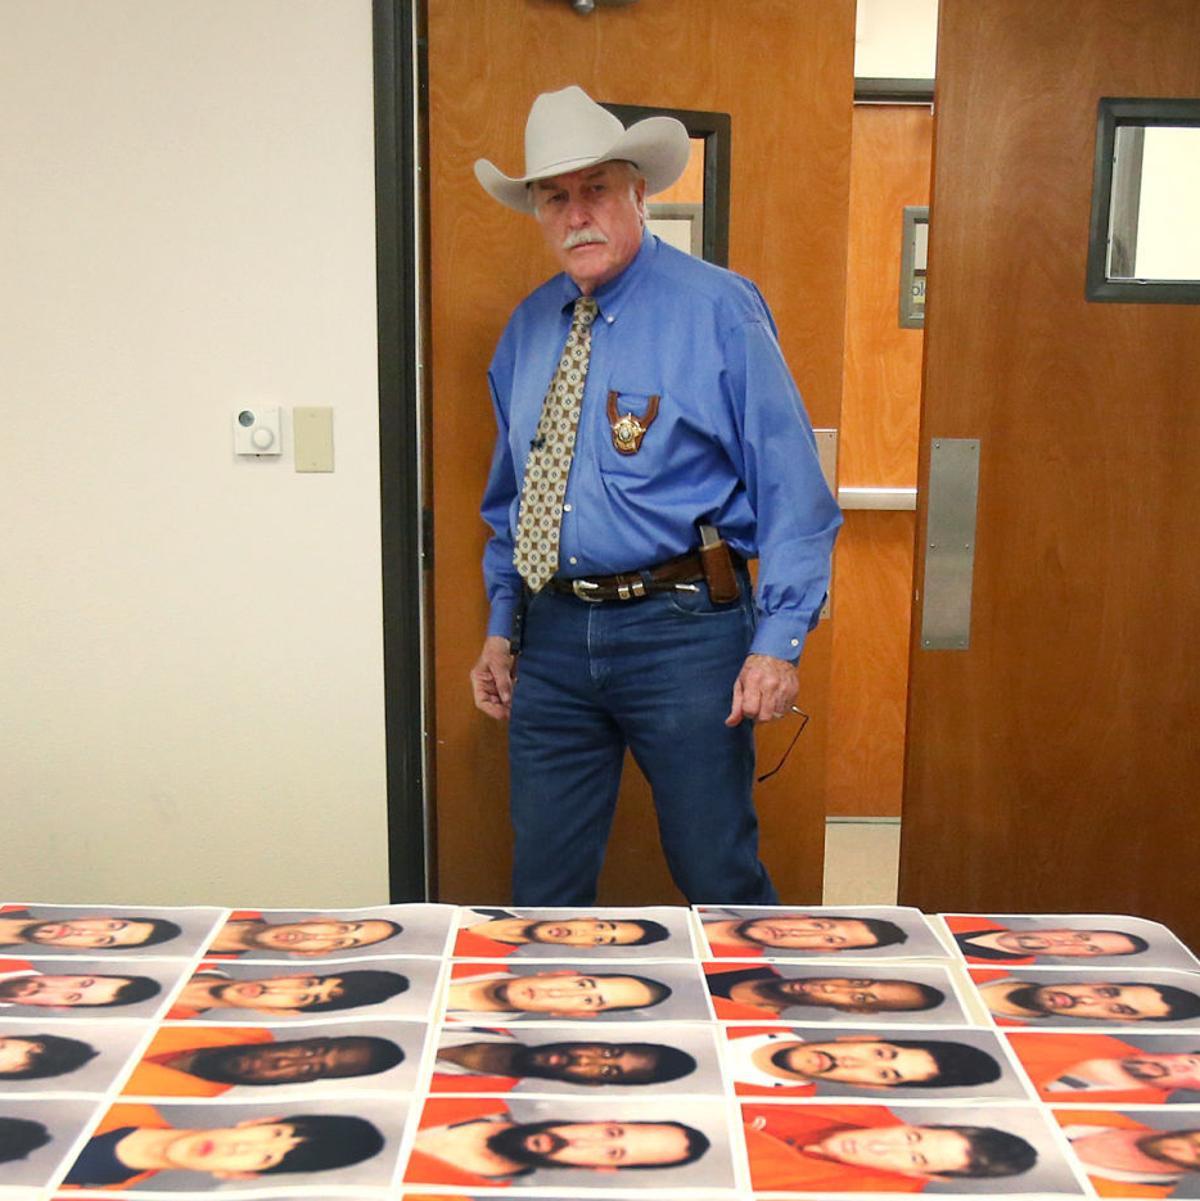 Sheriff's office shifting focus of anti-human trafficking efforts